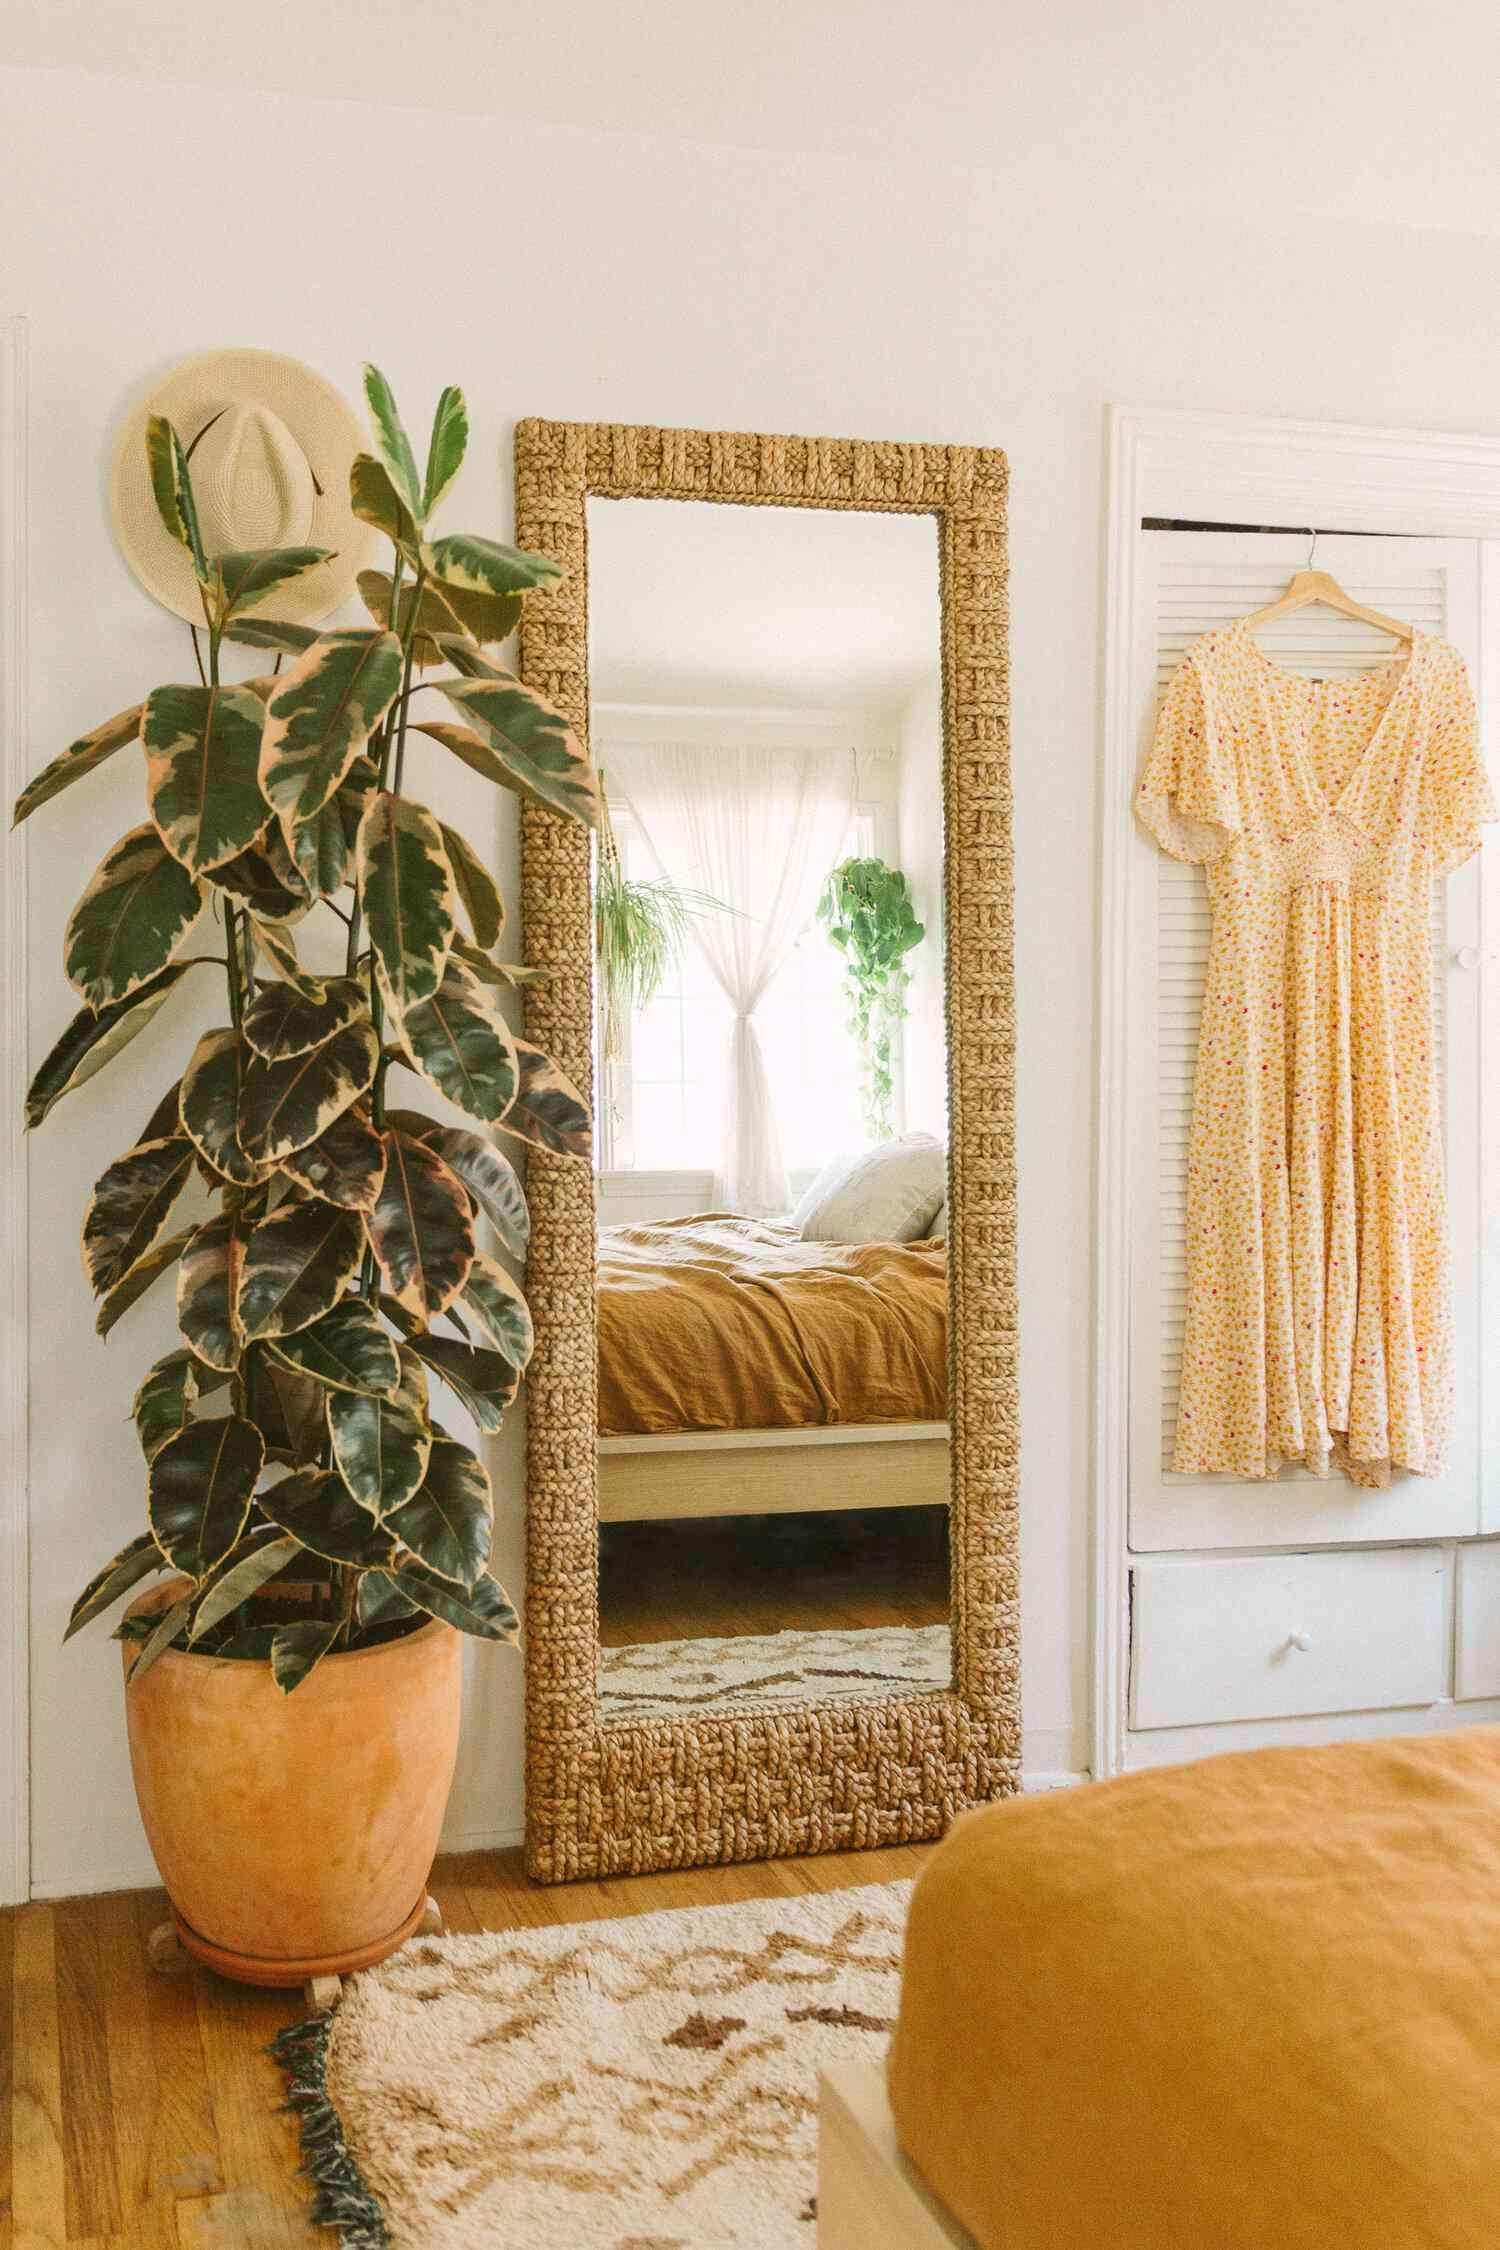 Closet area with full-length mirror